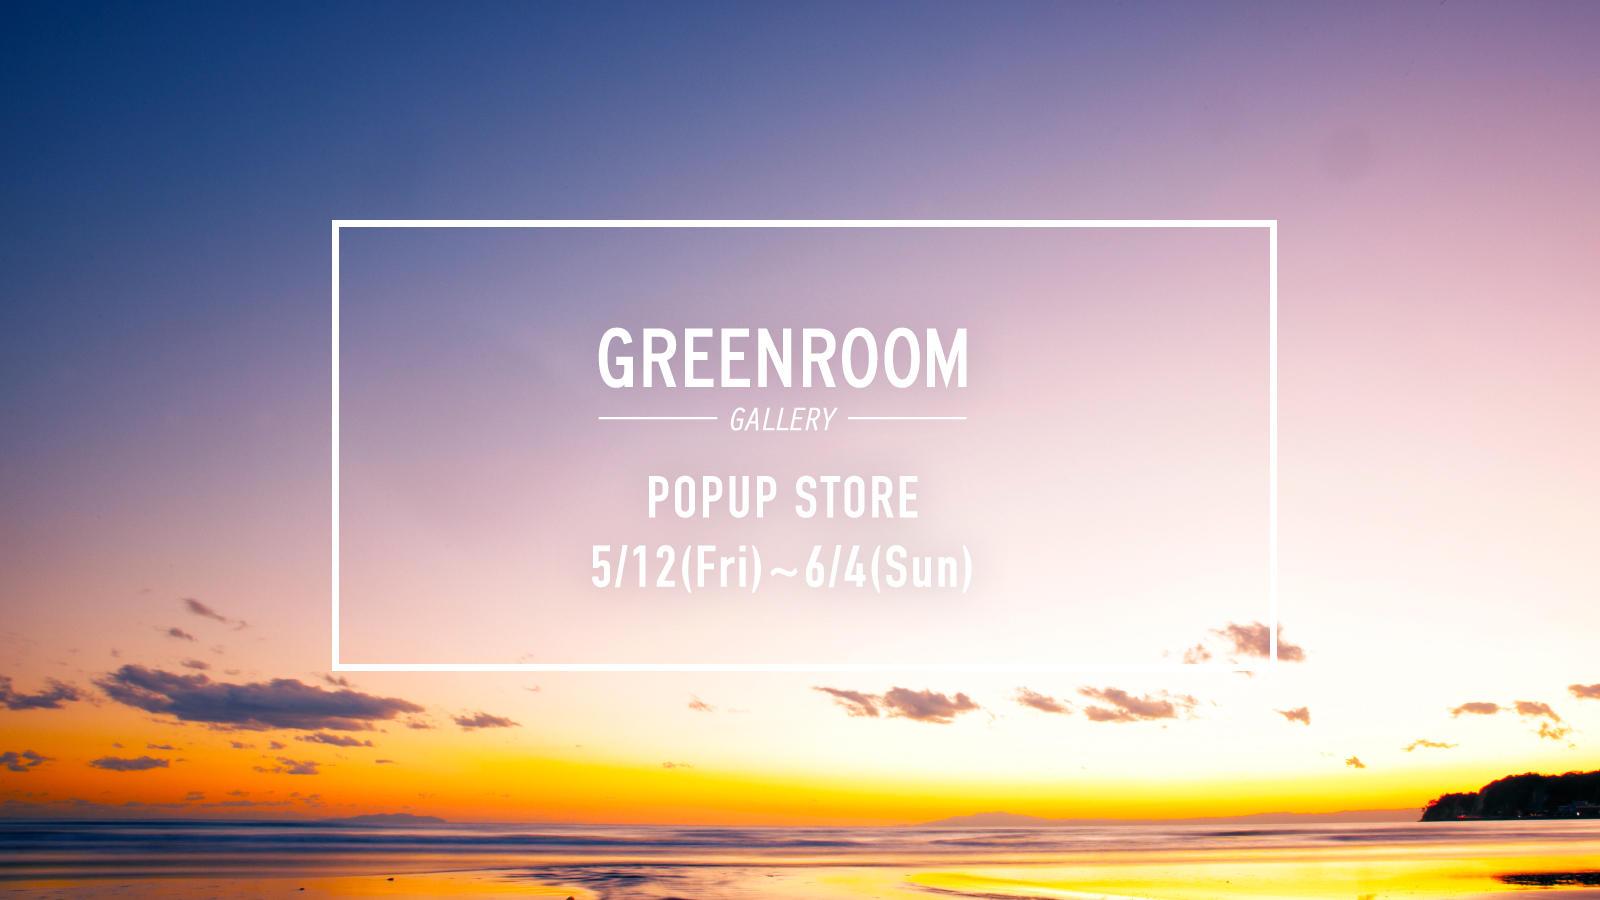 5.12fri-6.4sun 《GREENROOM GALLERY》 POPUP STORE OPEN